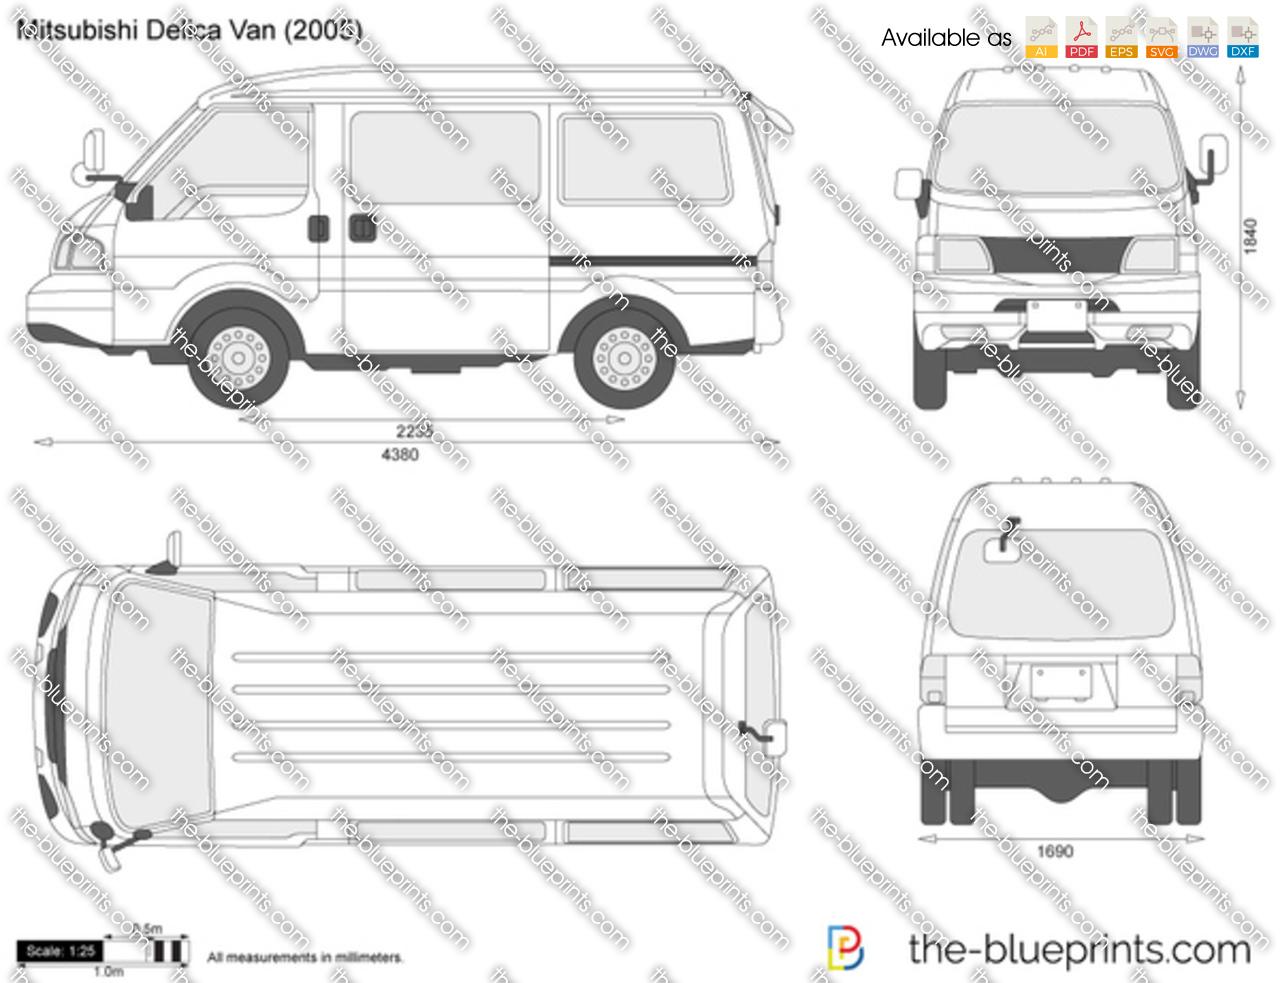 Mitsubishi Delica Van 2010